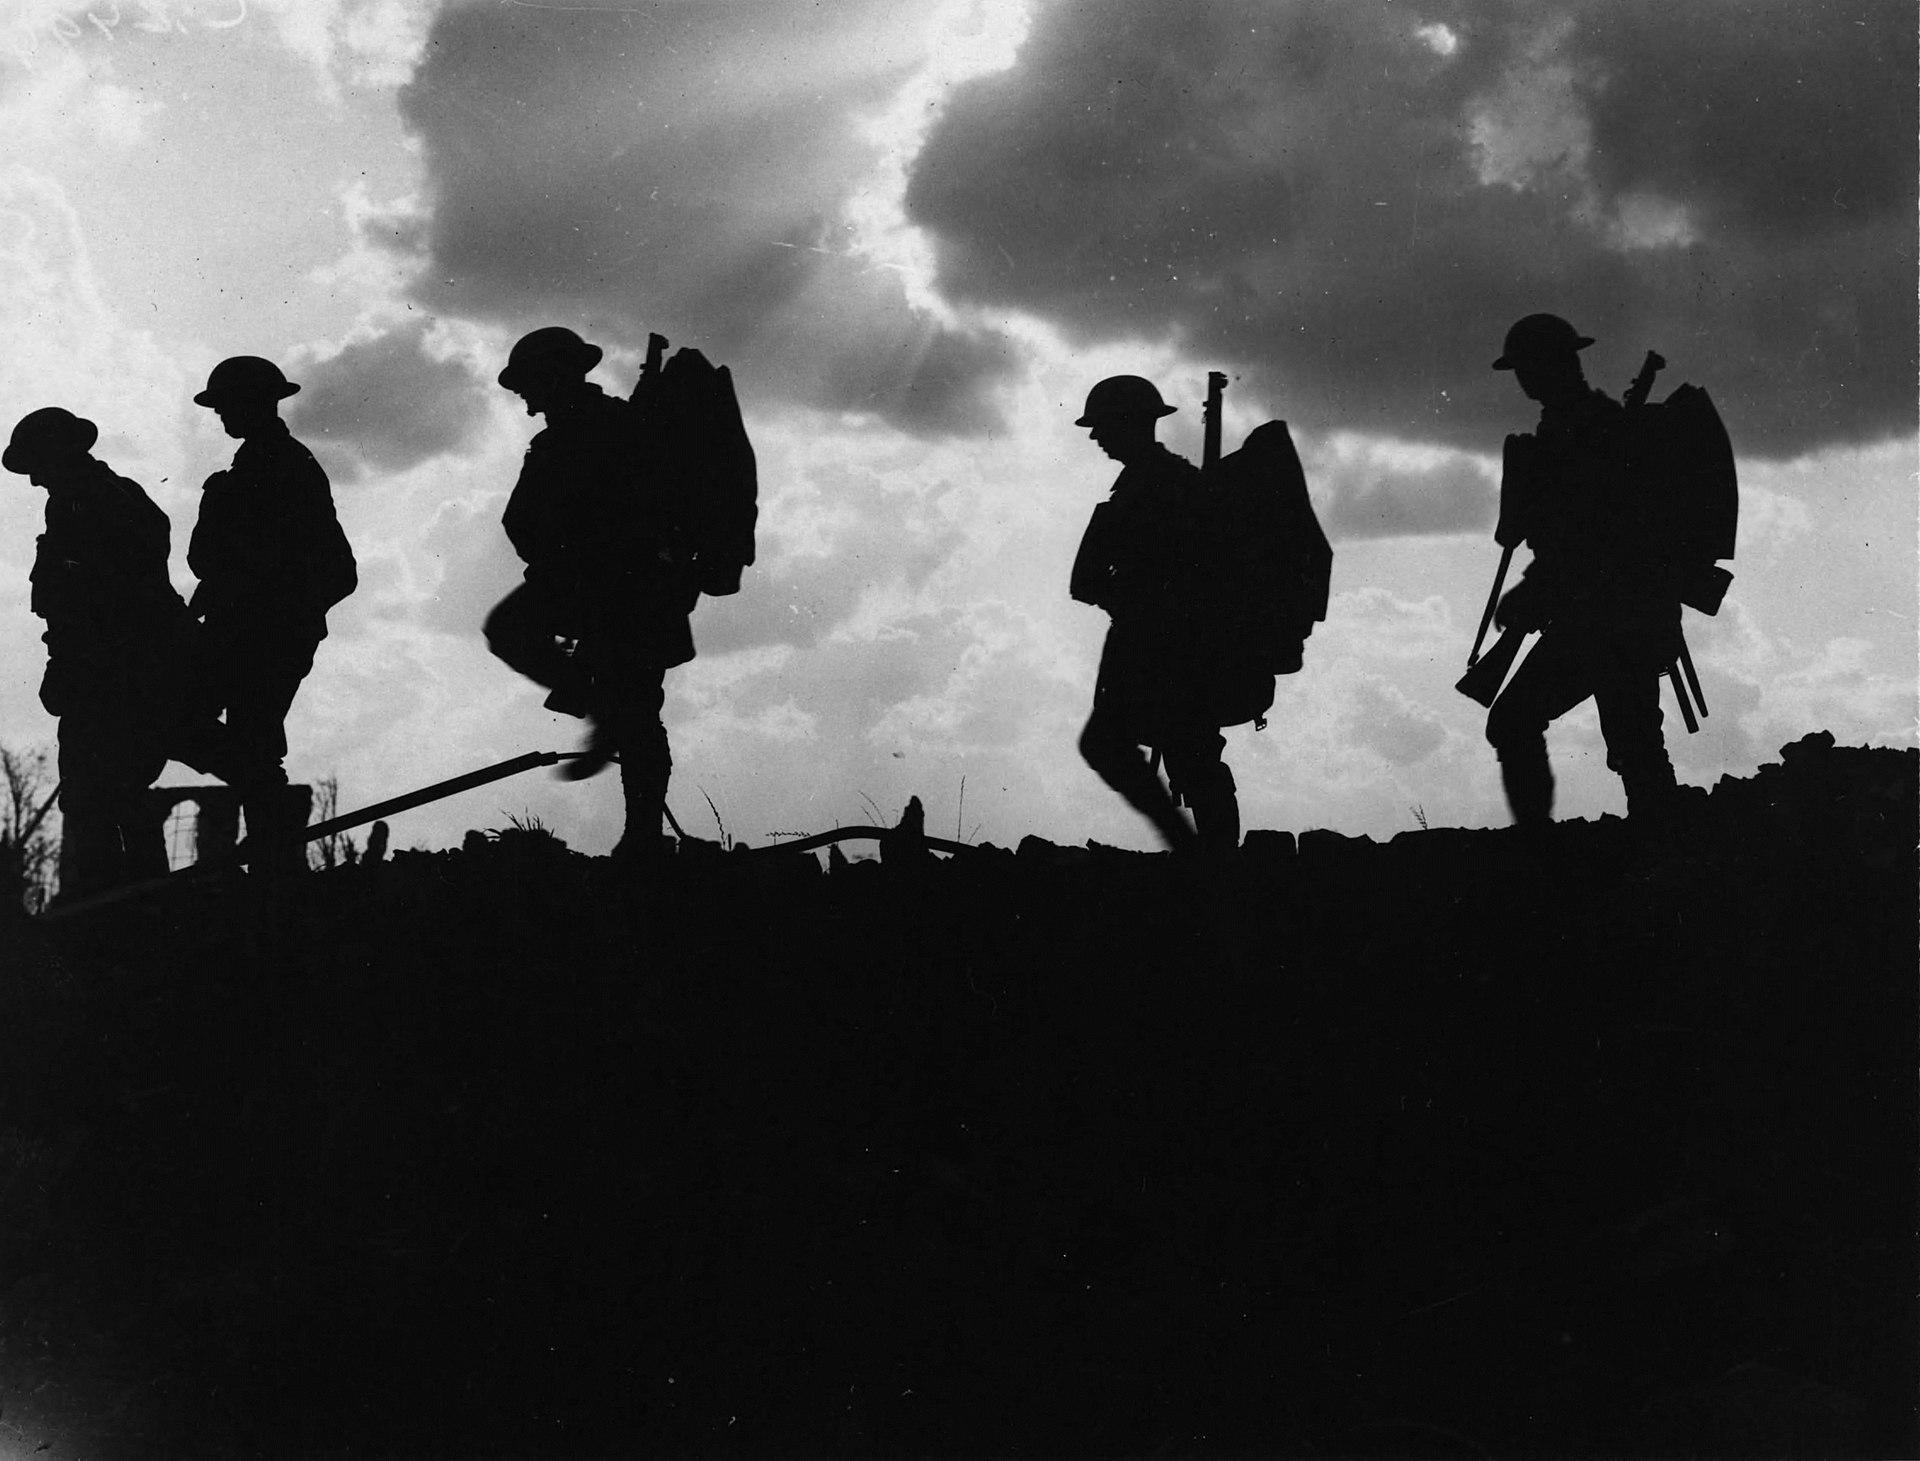 Wars of Words – Ten Must-Read Memoirs from the First World War